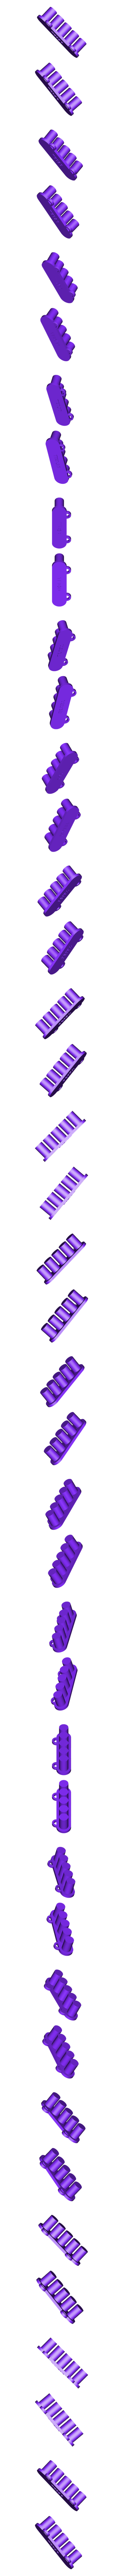 swing-STL.stl Download free STL file SWING • 3D printing template, TED3D